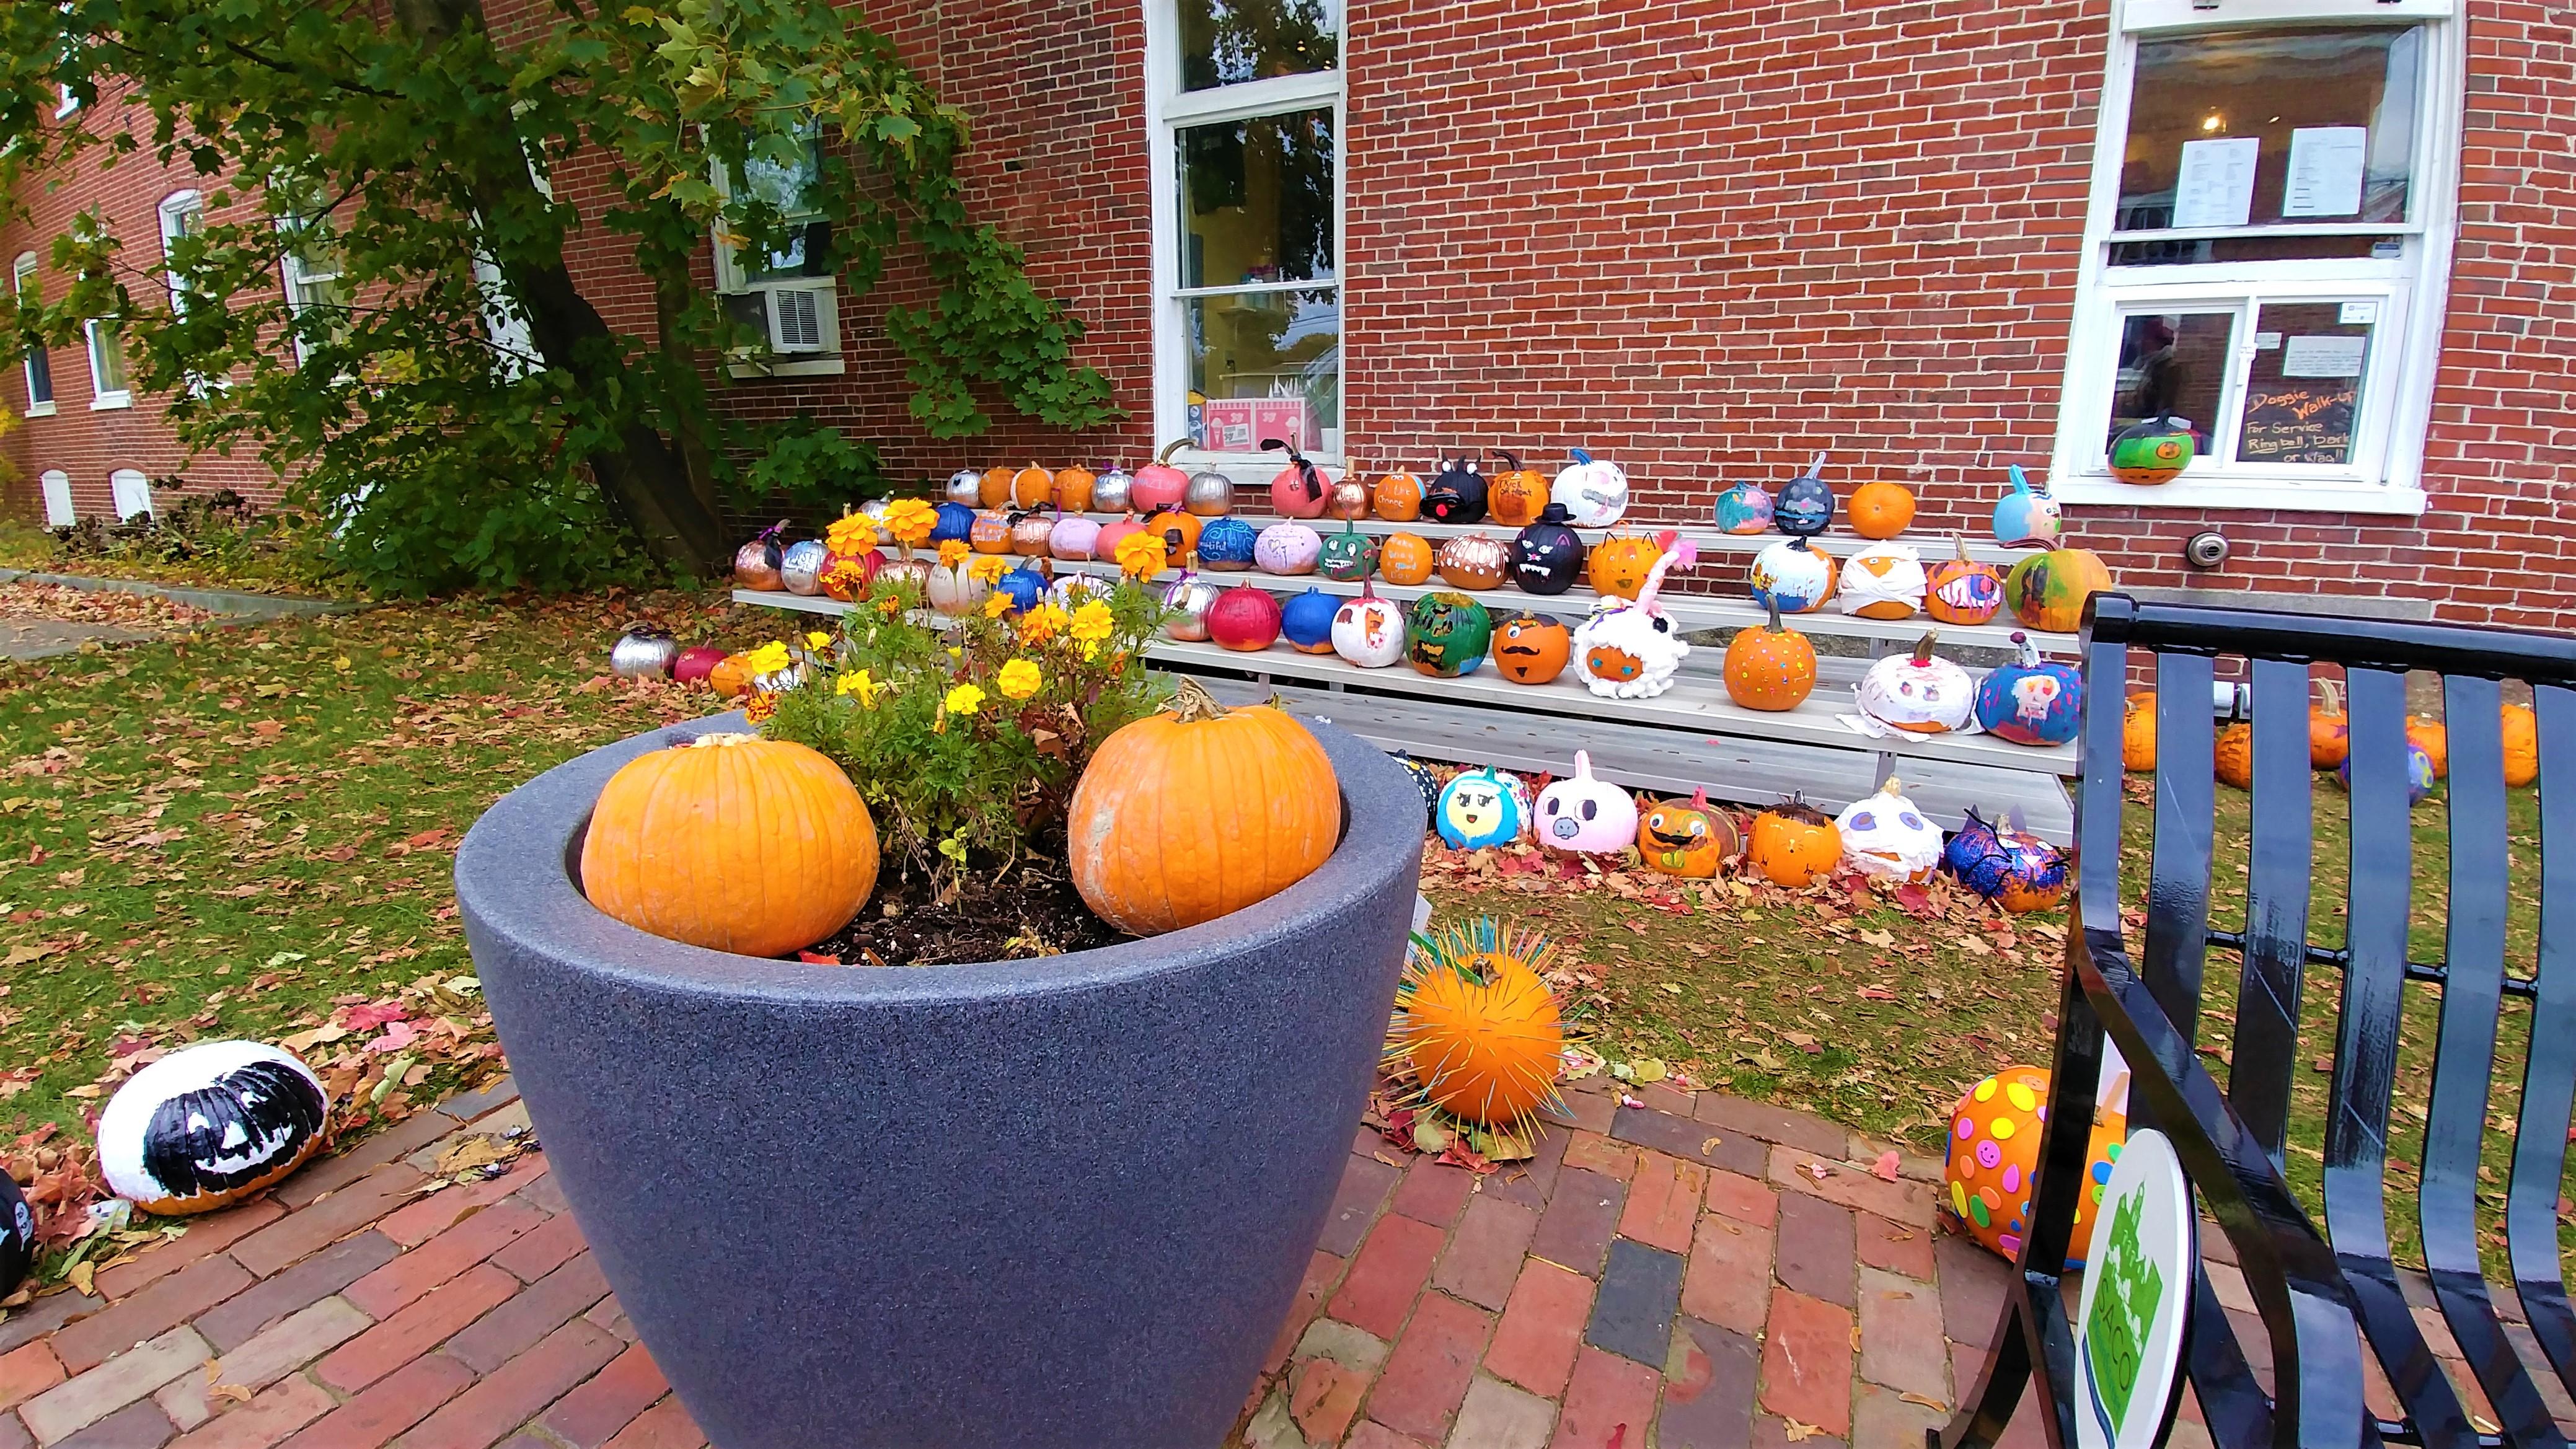 saco jack o lantern citrouilles halloween automne boston road-trip blog voyage arpenter le chemin